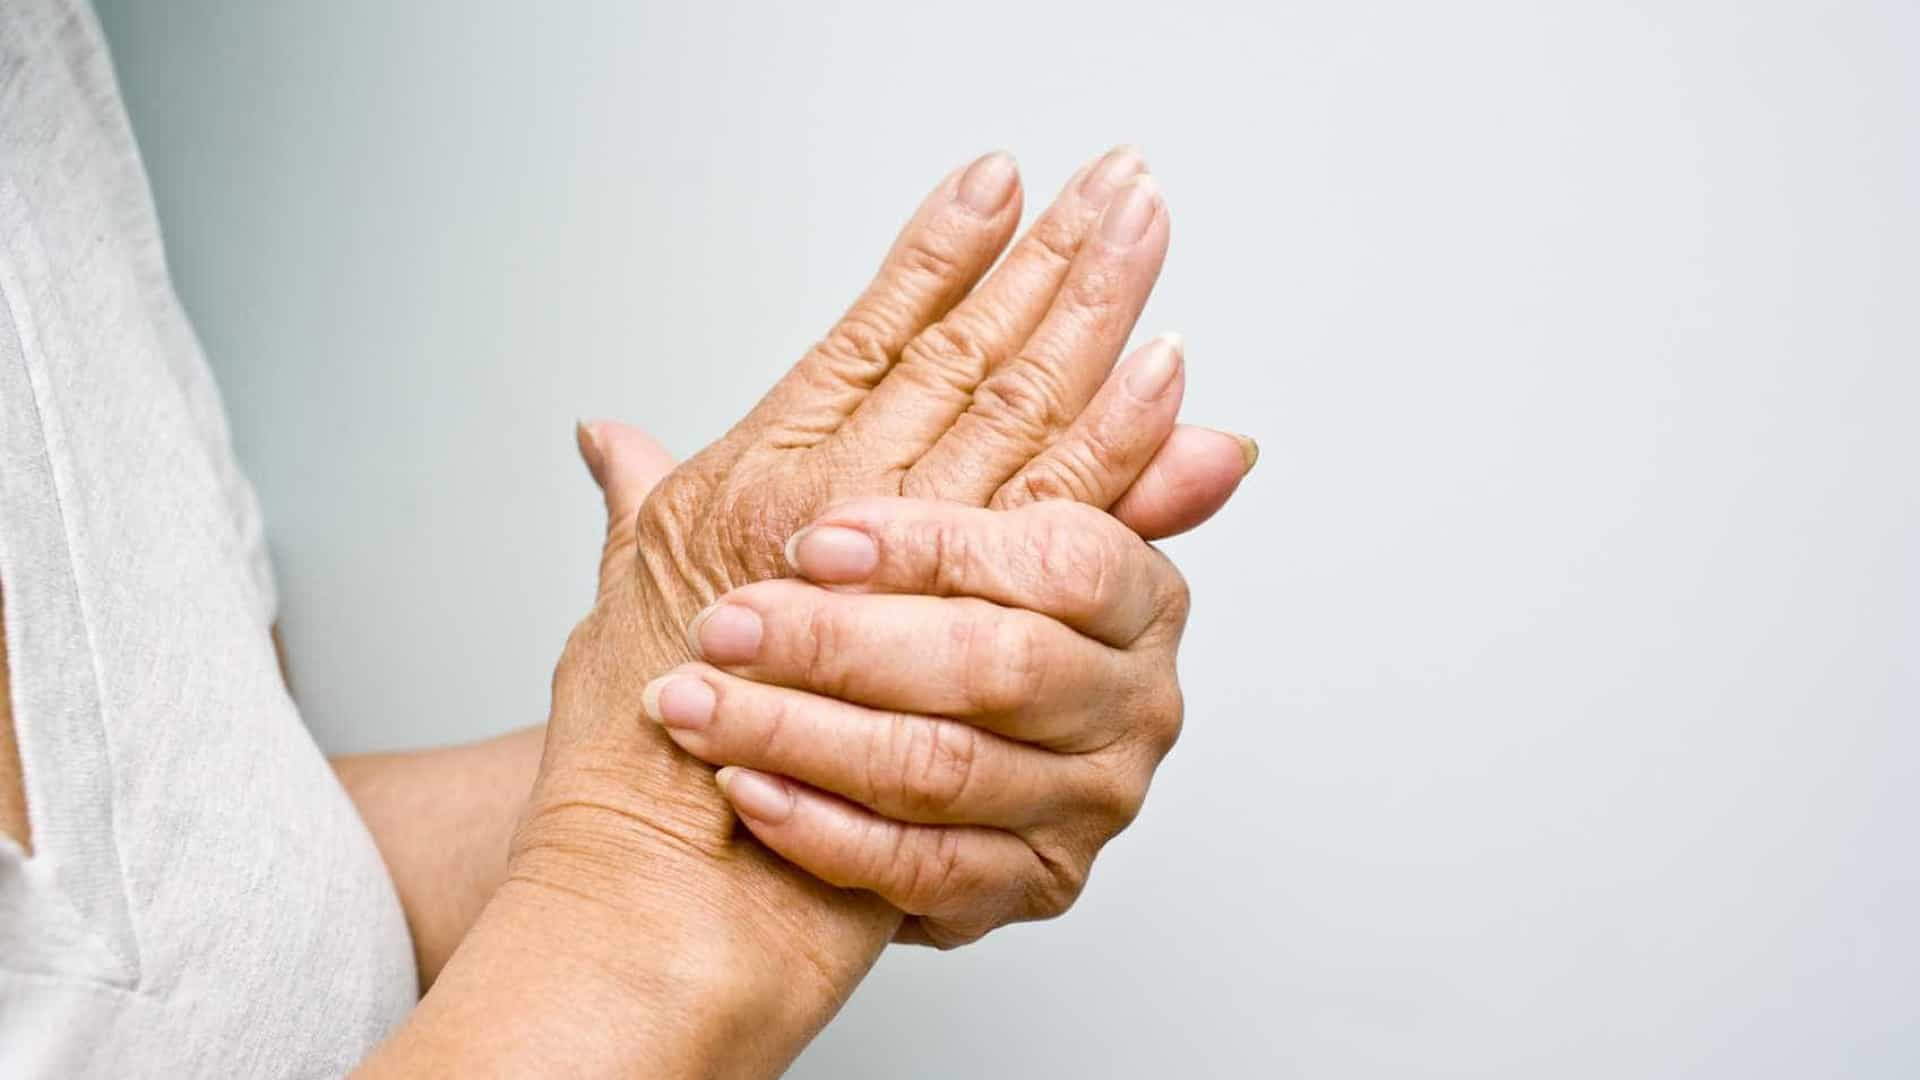 Dieta mediterrânea pode aliviar sintomas da artrite, diz estudo